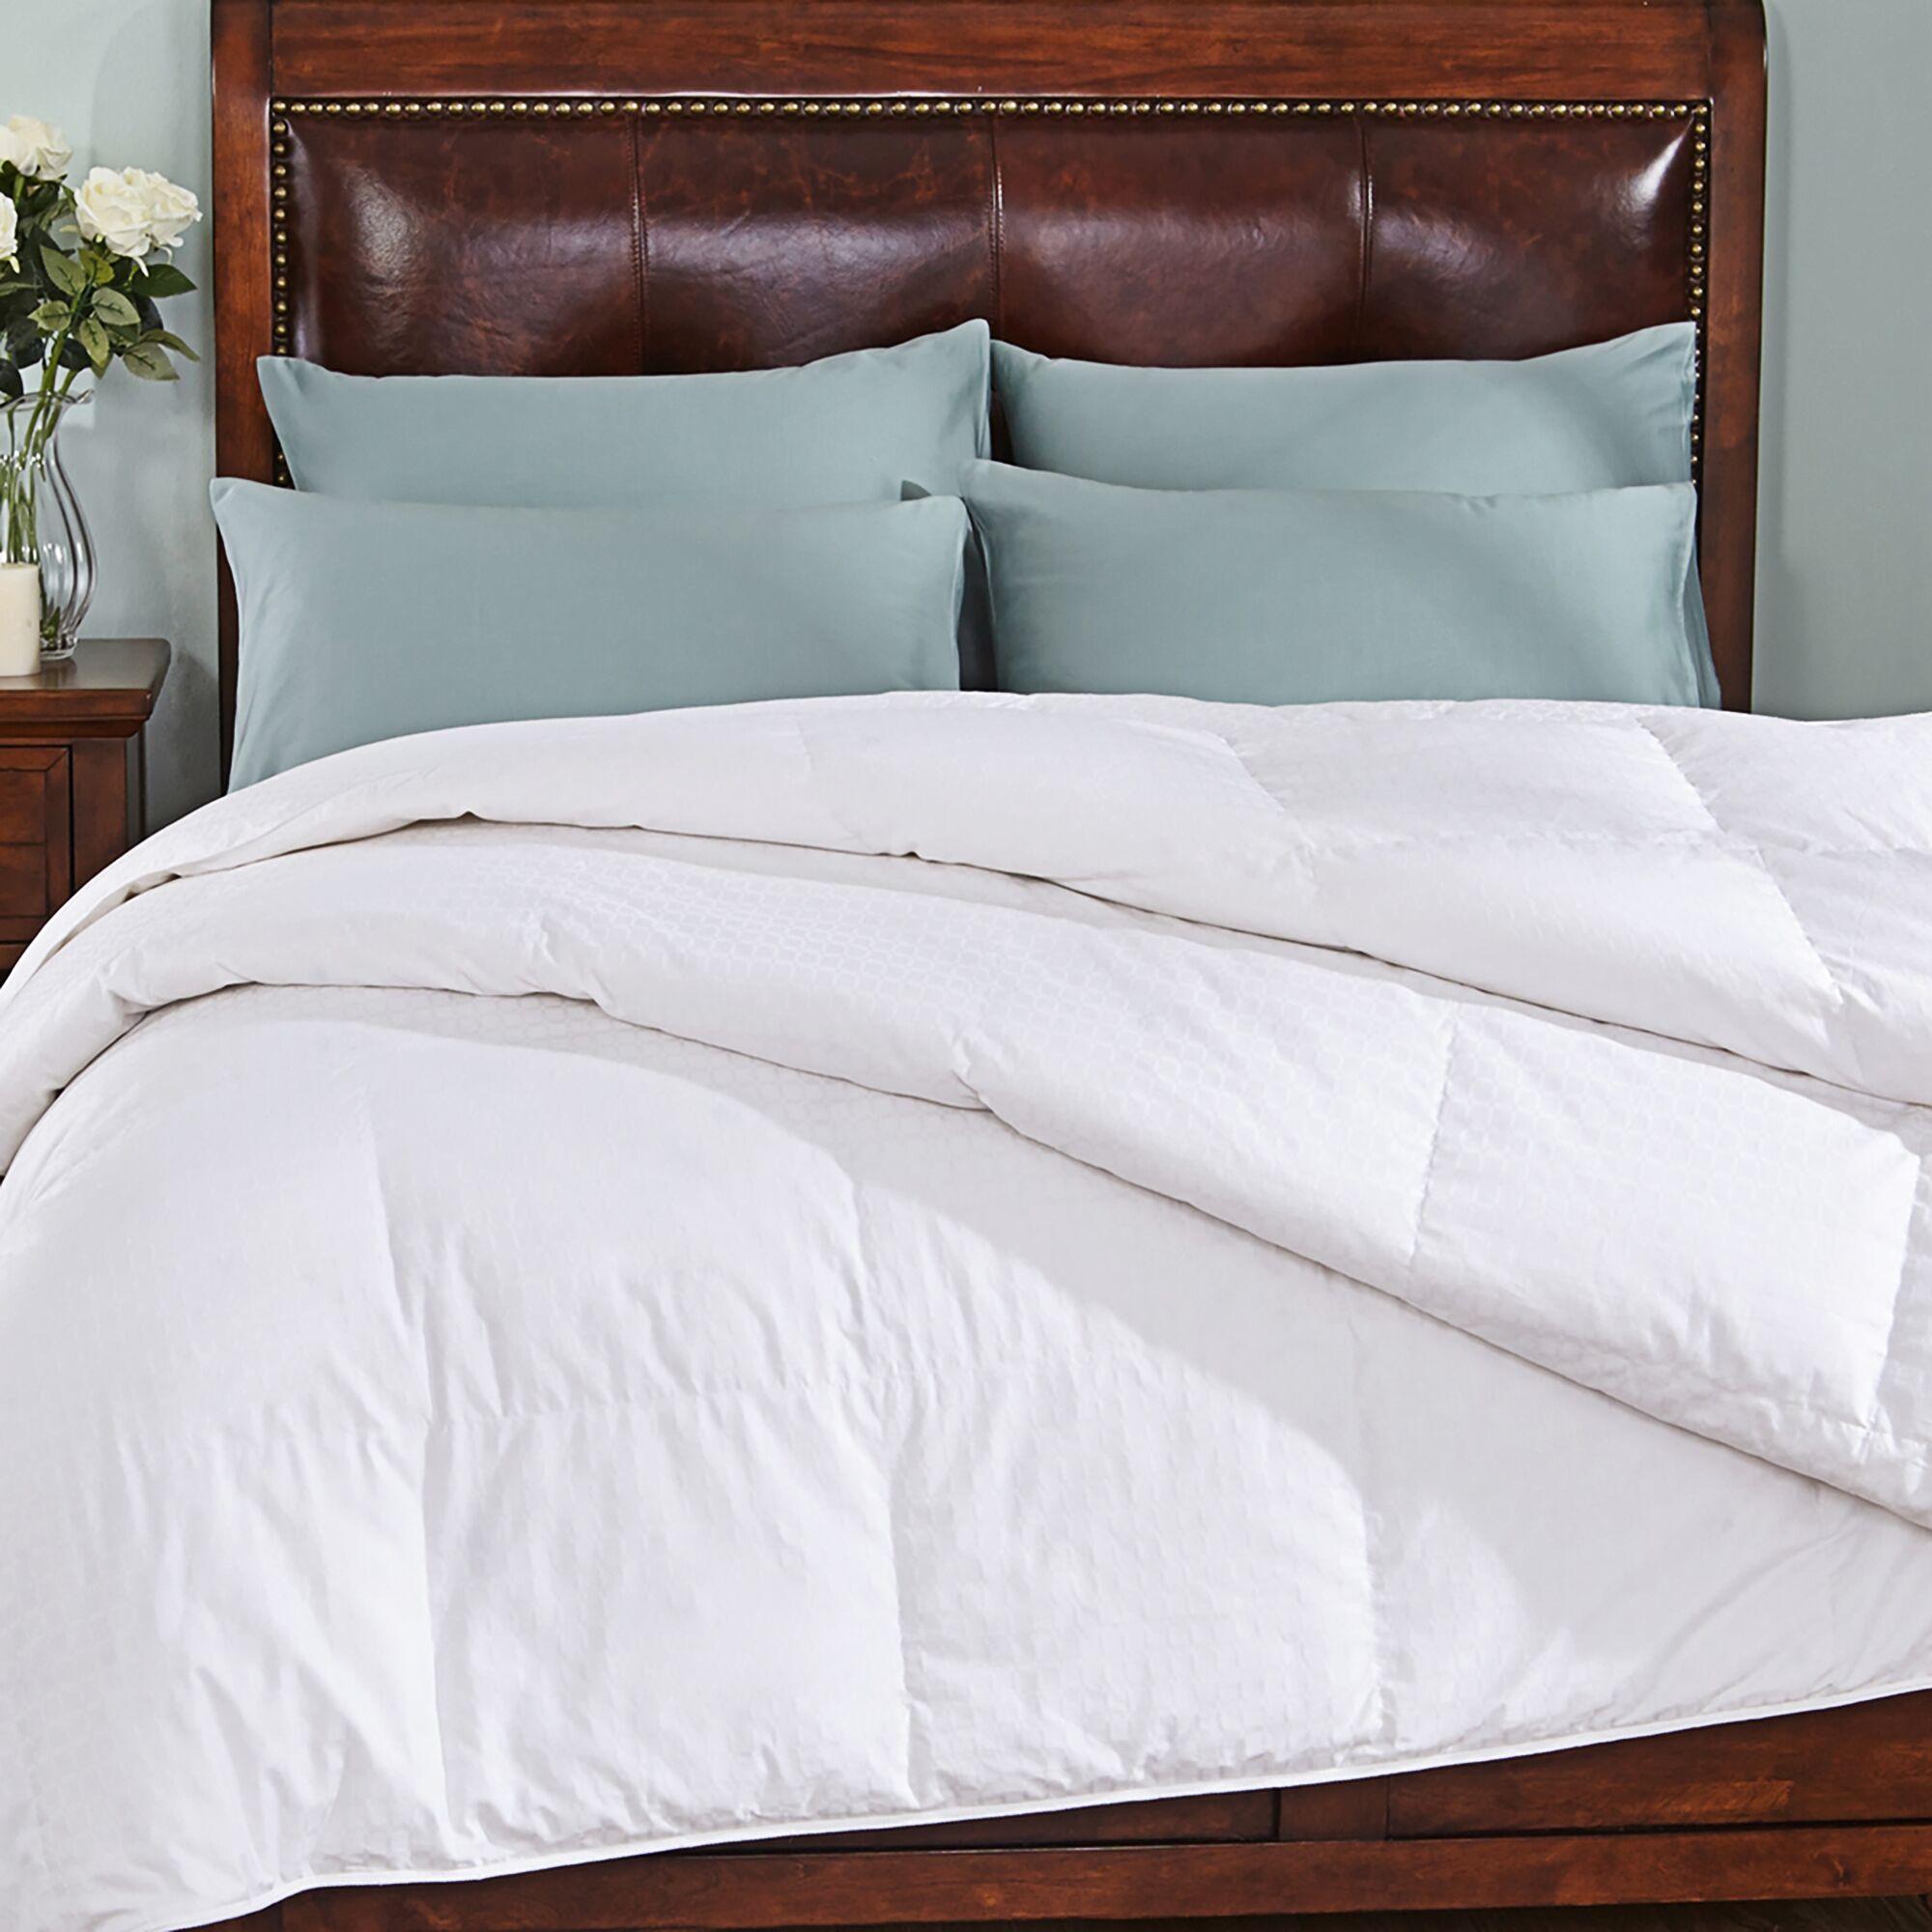 Luxurious lightweight Down Alternative Comforter Size: Full